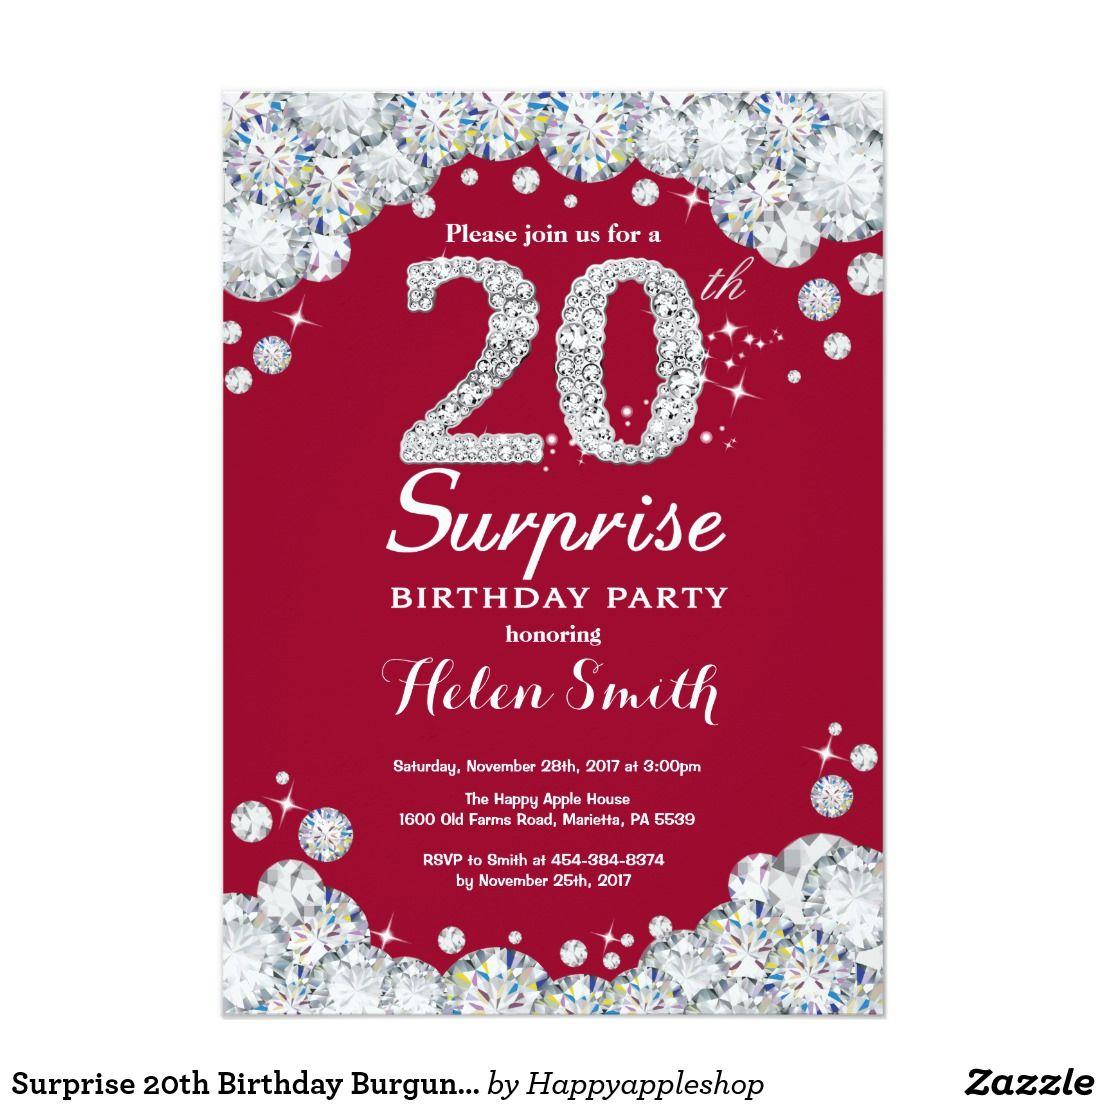 Surprise 20th Birthday Burgundy Red Silver Diamond